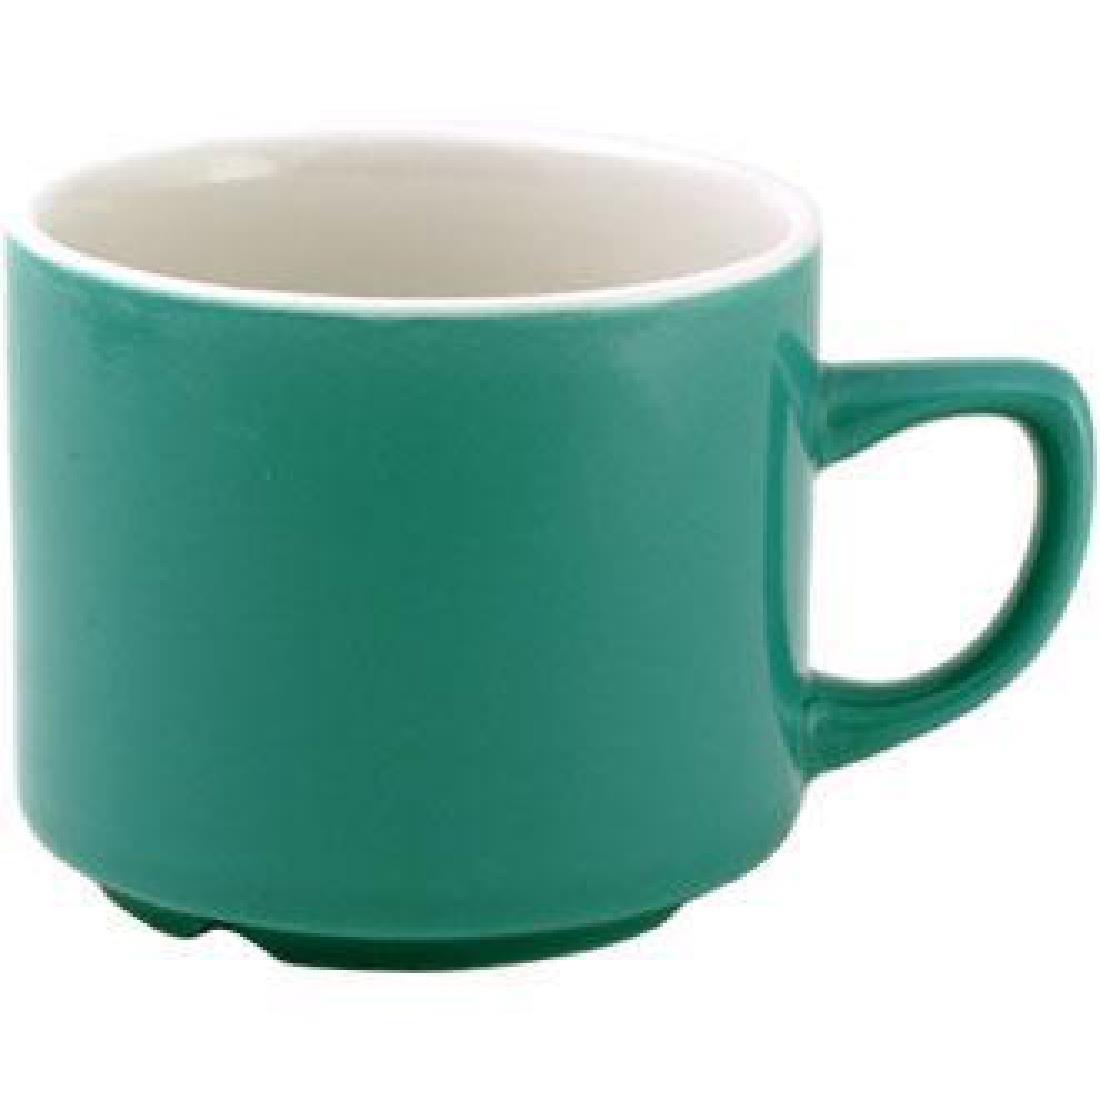 Churchill New Horizons Colour Glaze Maple Tea Cups Green 199ml (Pack of 24) (M820)